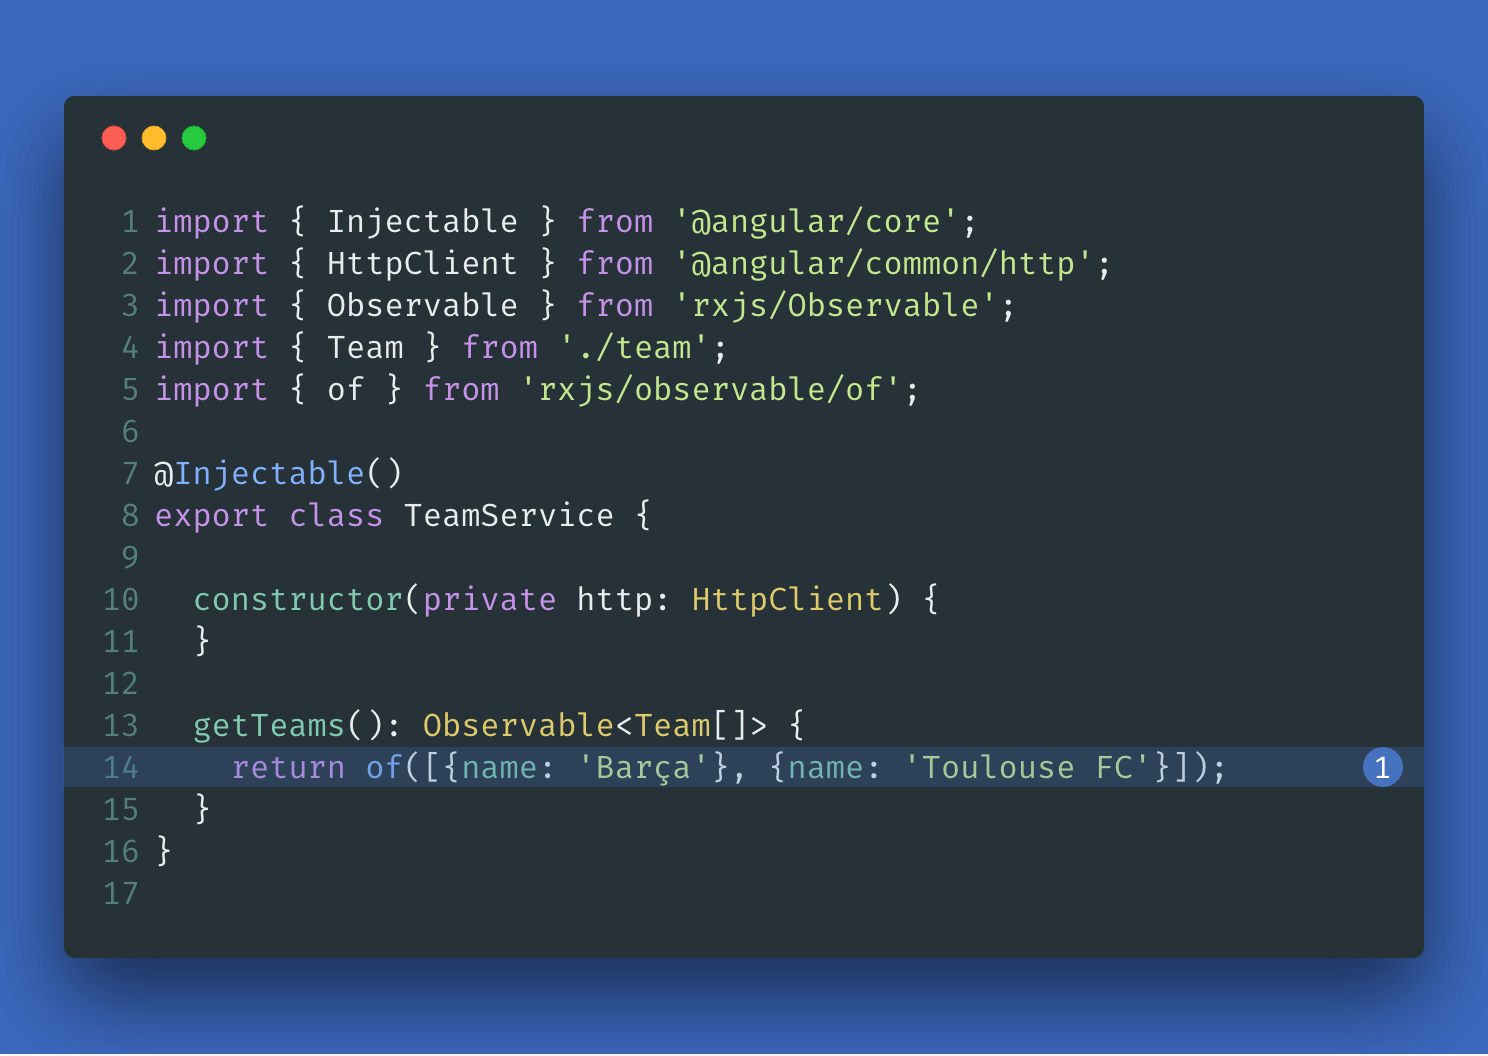 TeamService-hard-coded